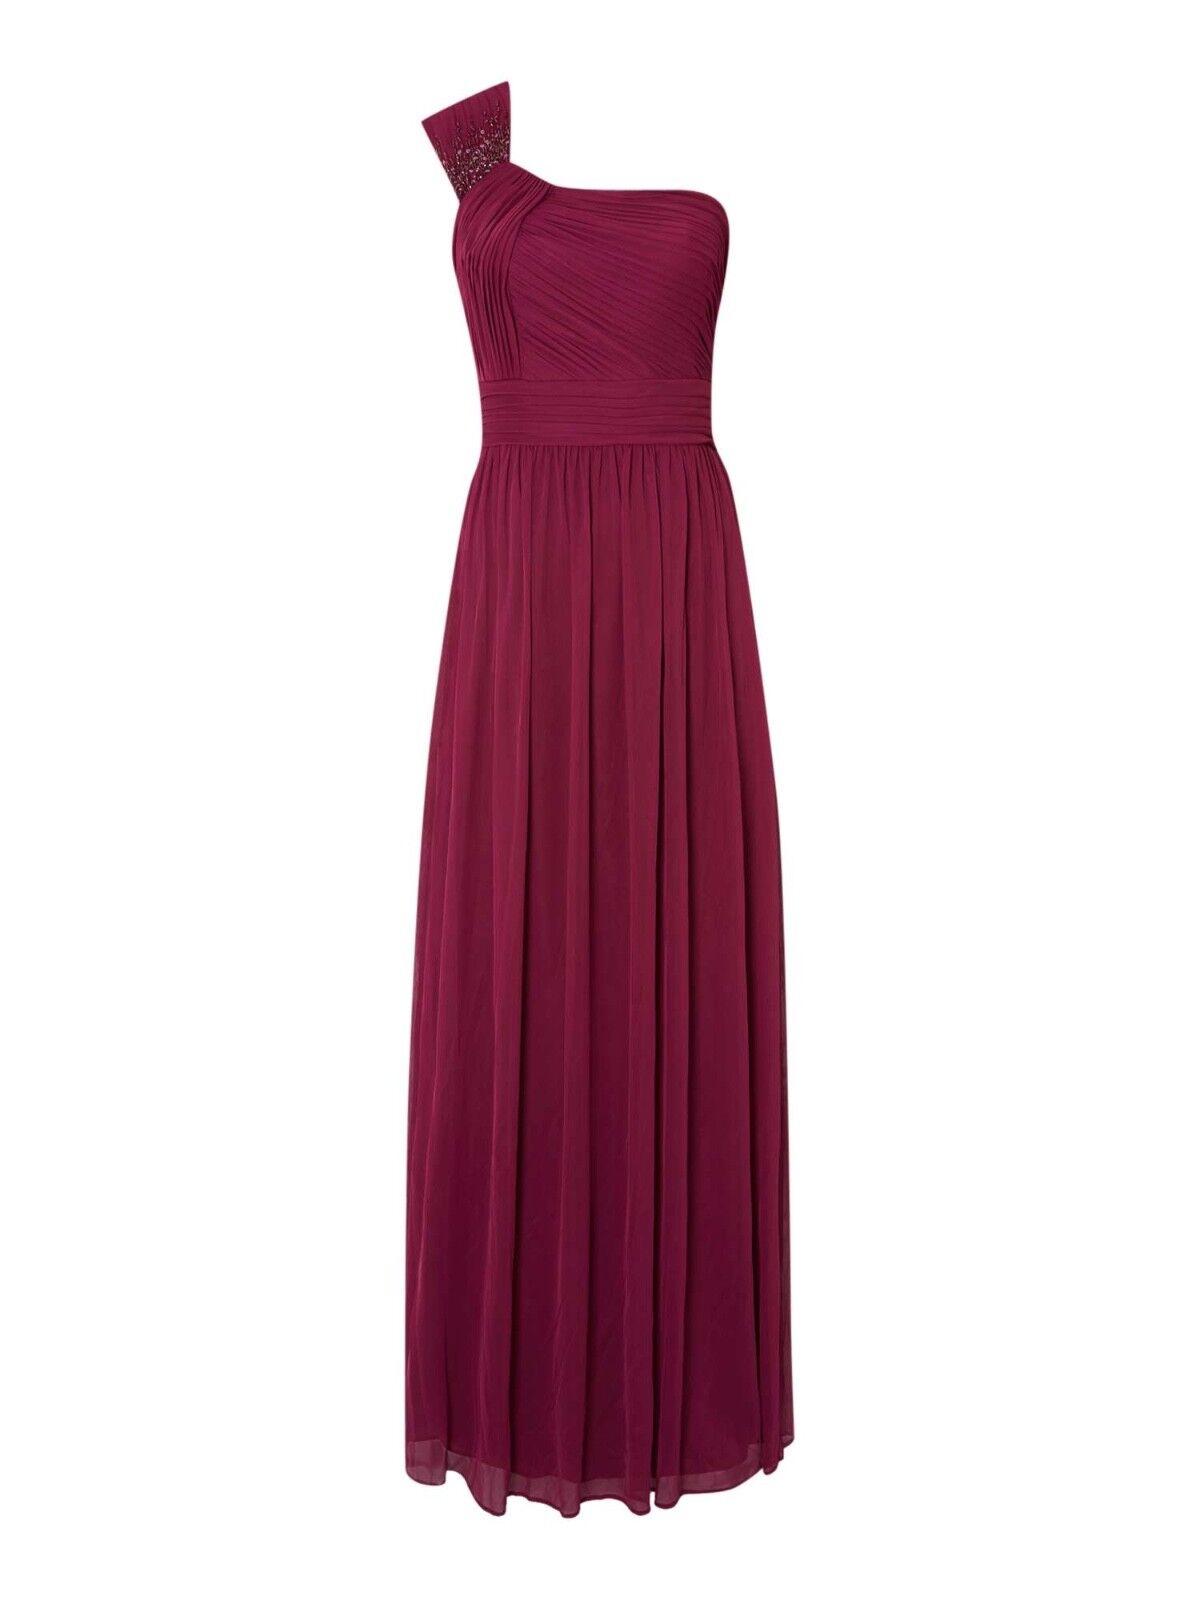 BARGAIN   BNWT JS COLLECTION BERRY BRIDESMAID MAXI MAXI MAXI DRESS Size  12 RRP  5d4723